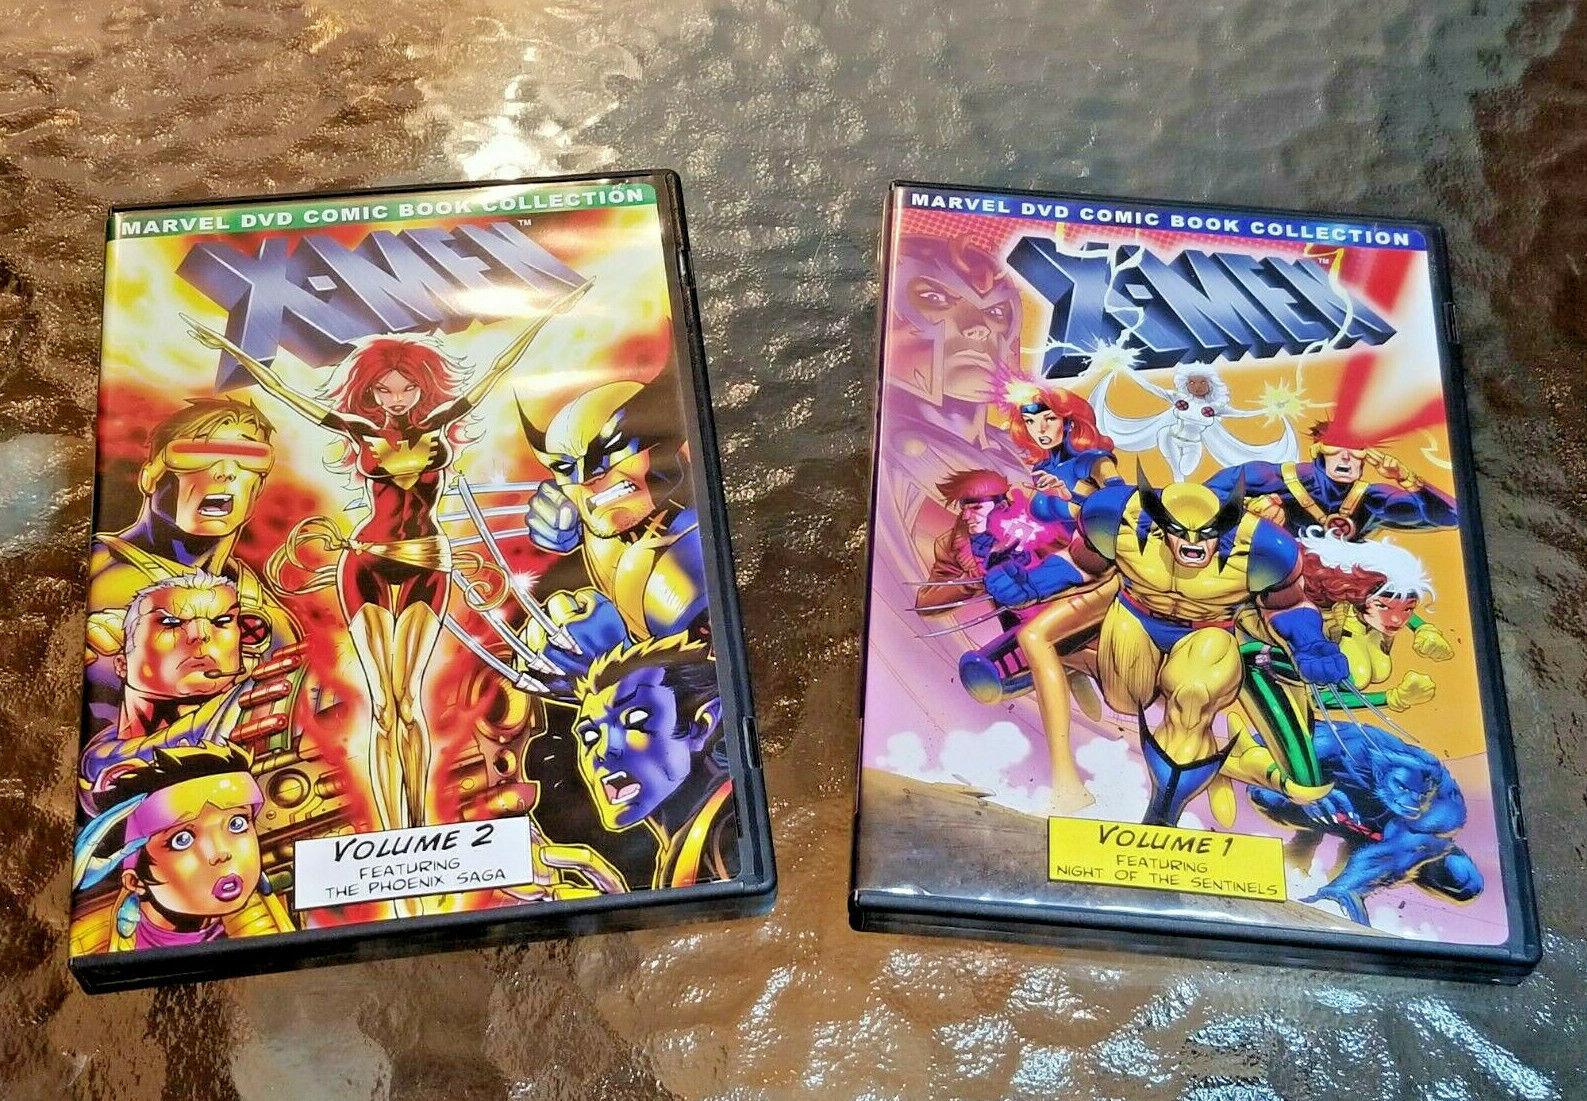 Marvel DVD s Collection X-MEN Animated Series Cartoon VoL 1 2 Set s X MEN  - $55.00